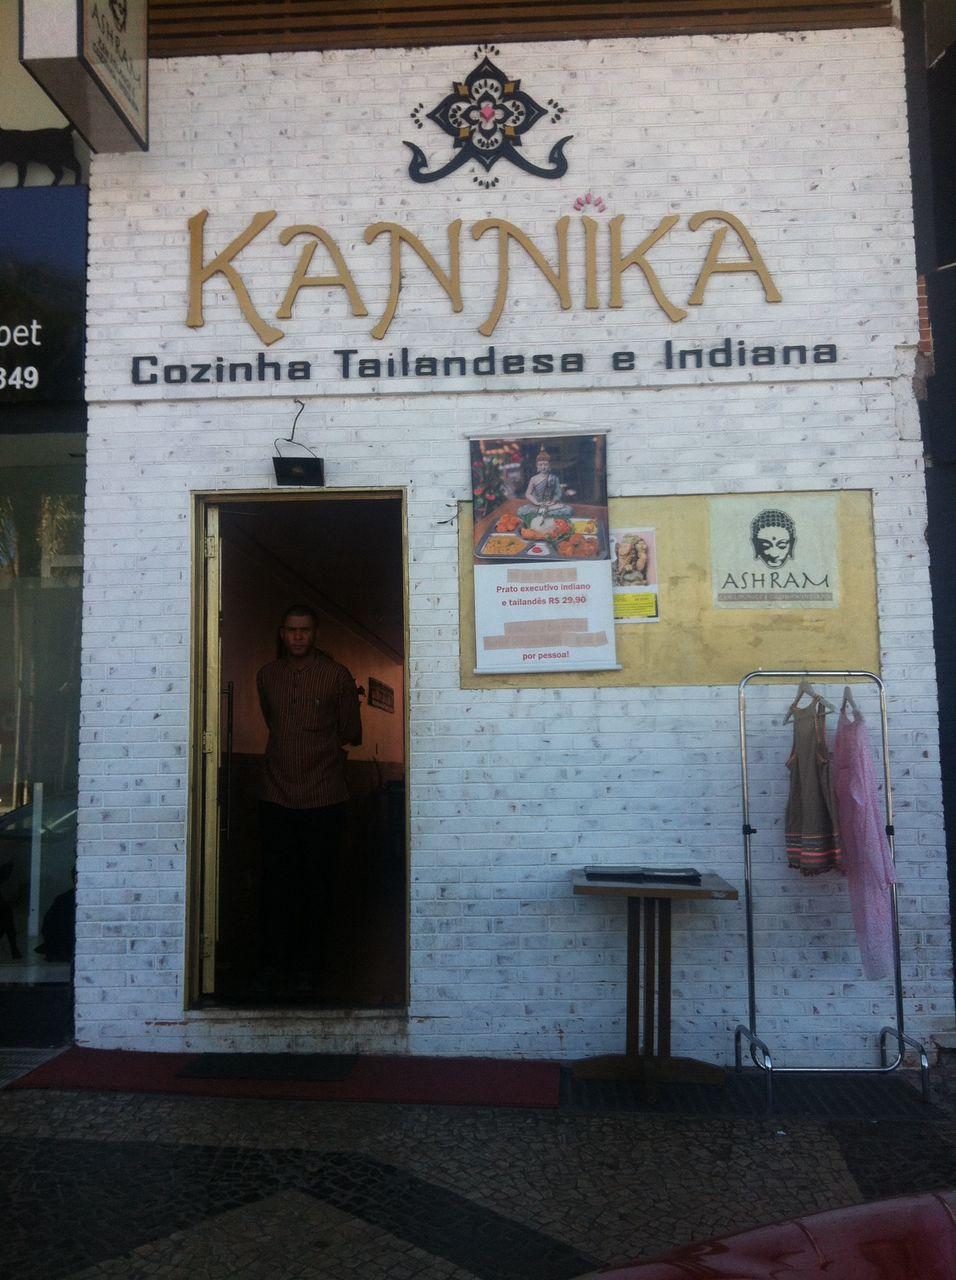 Kannika Comida Tailandesa e Indiana, Quadra 408 Sul, Bloco C, Loja 9, Asa Sul, Comércio de Brasília